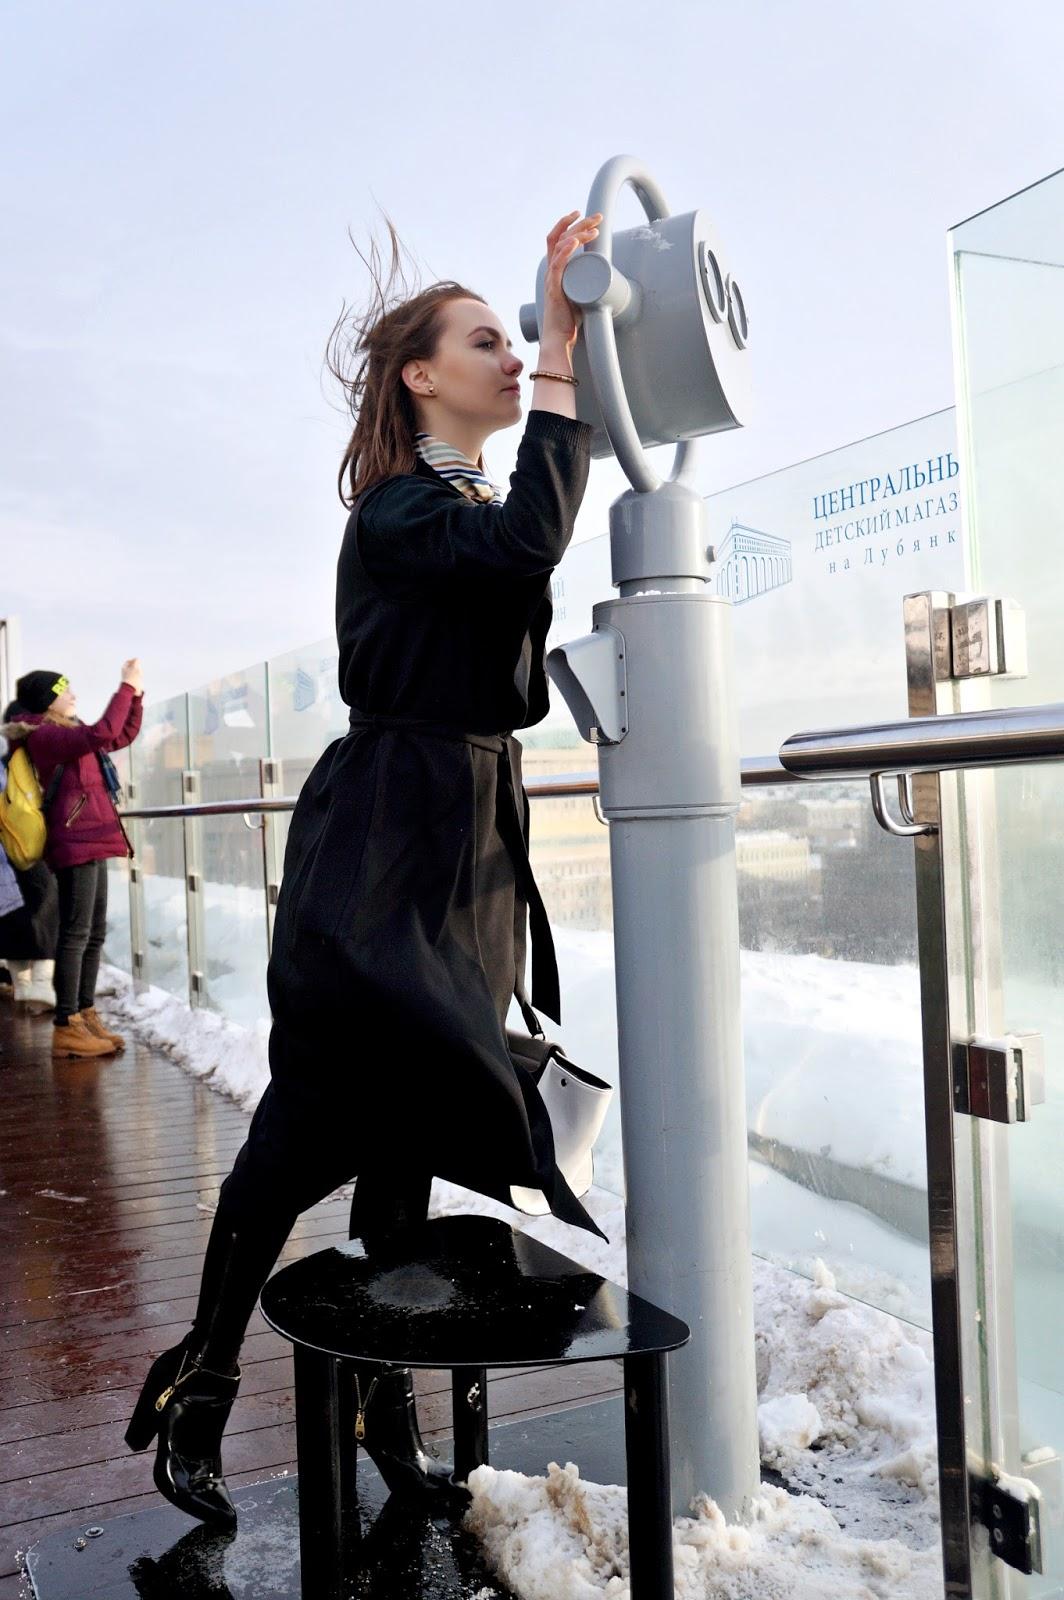 Moscow | Alina Ermilova | Travel blogger